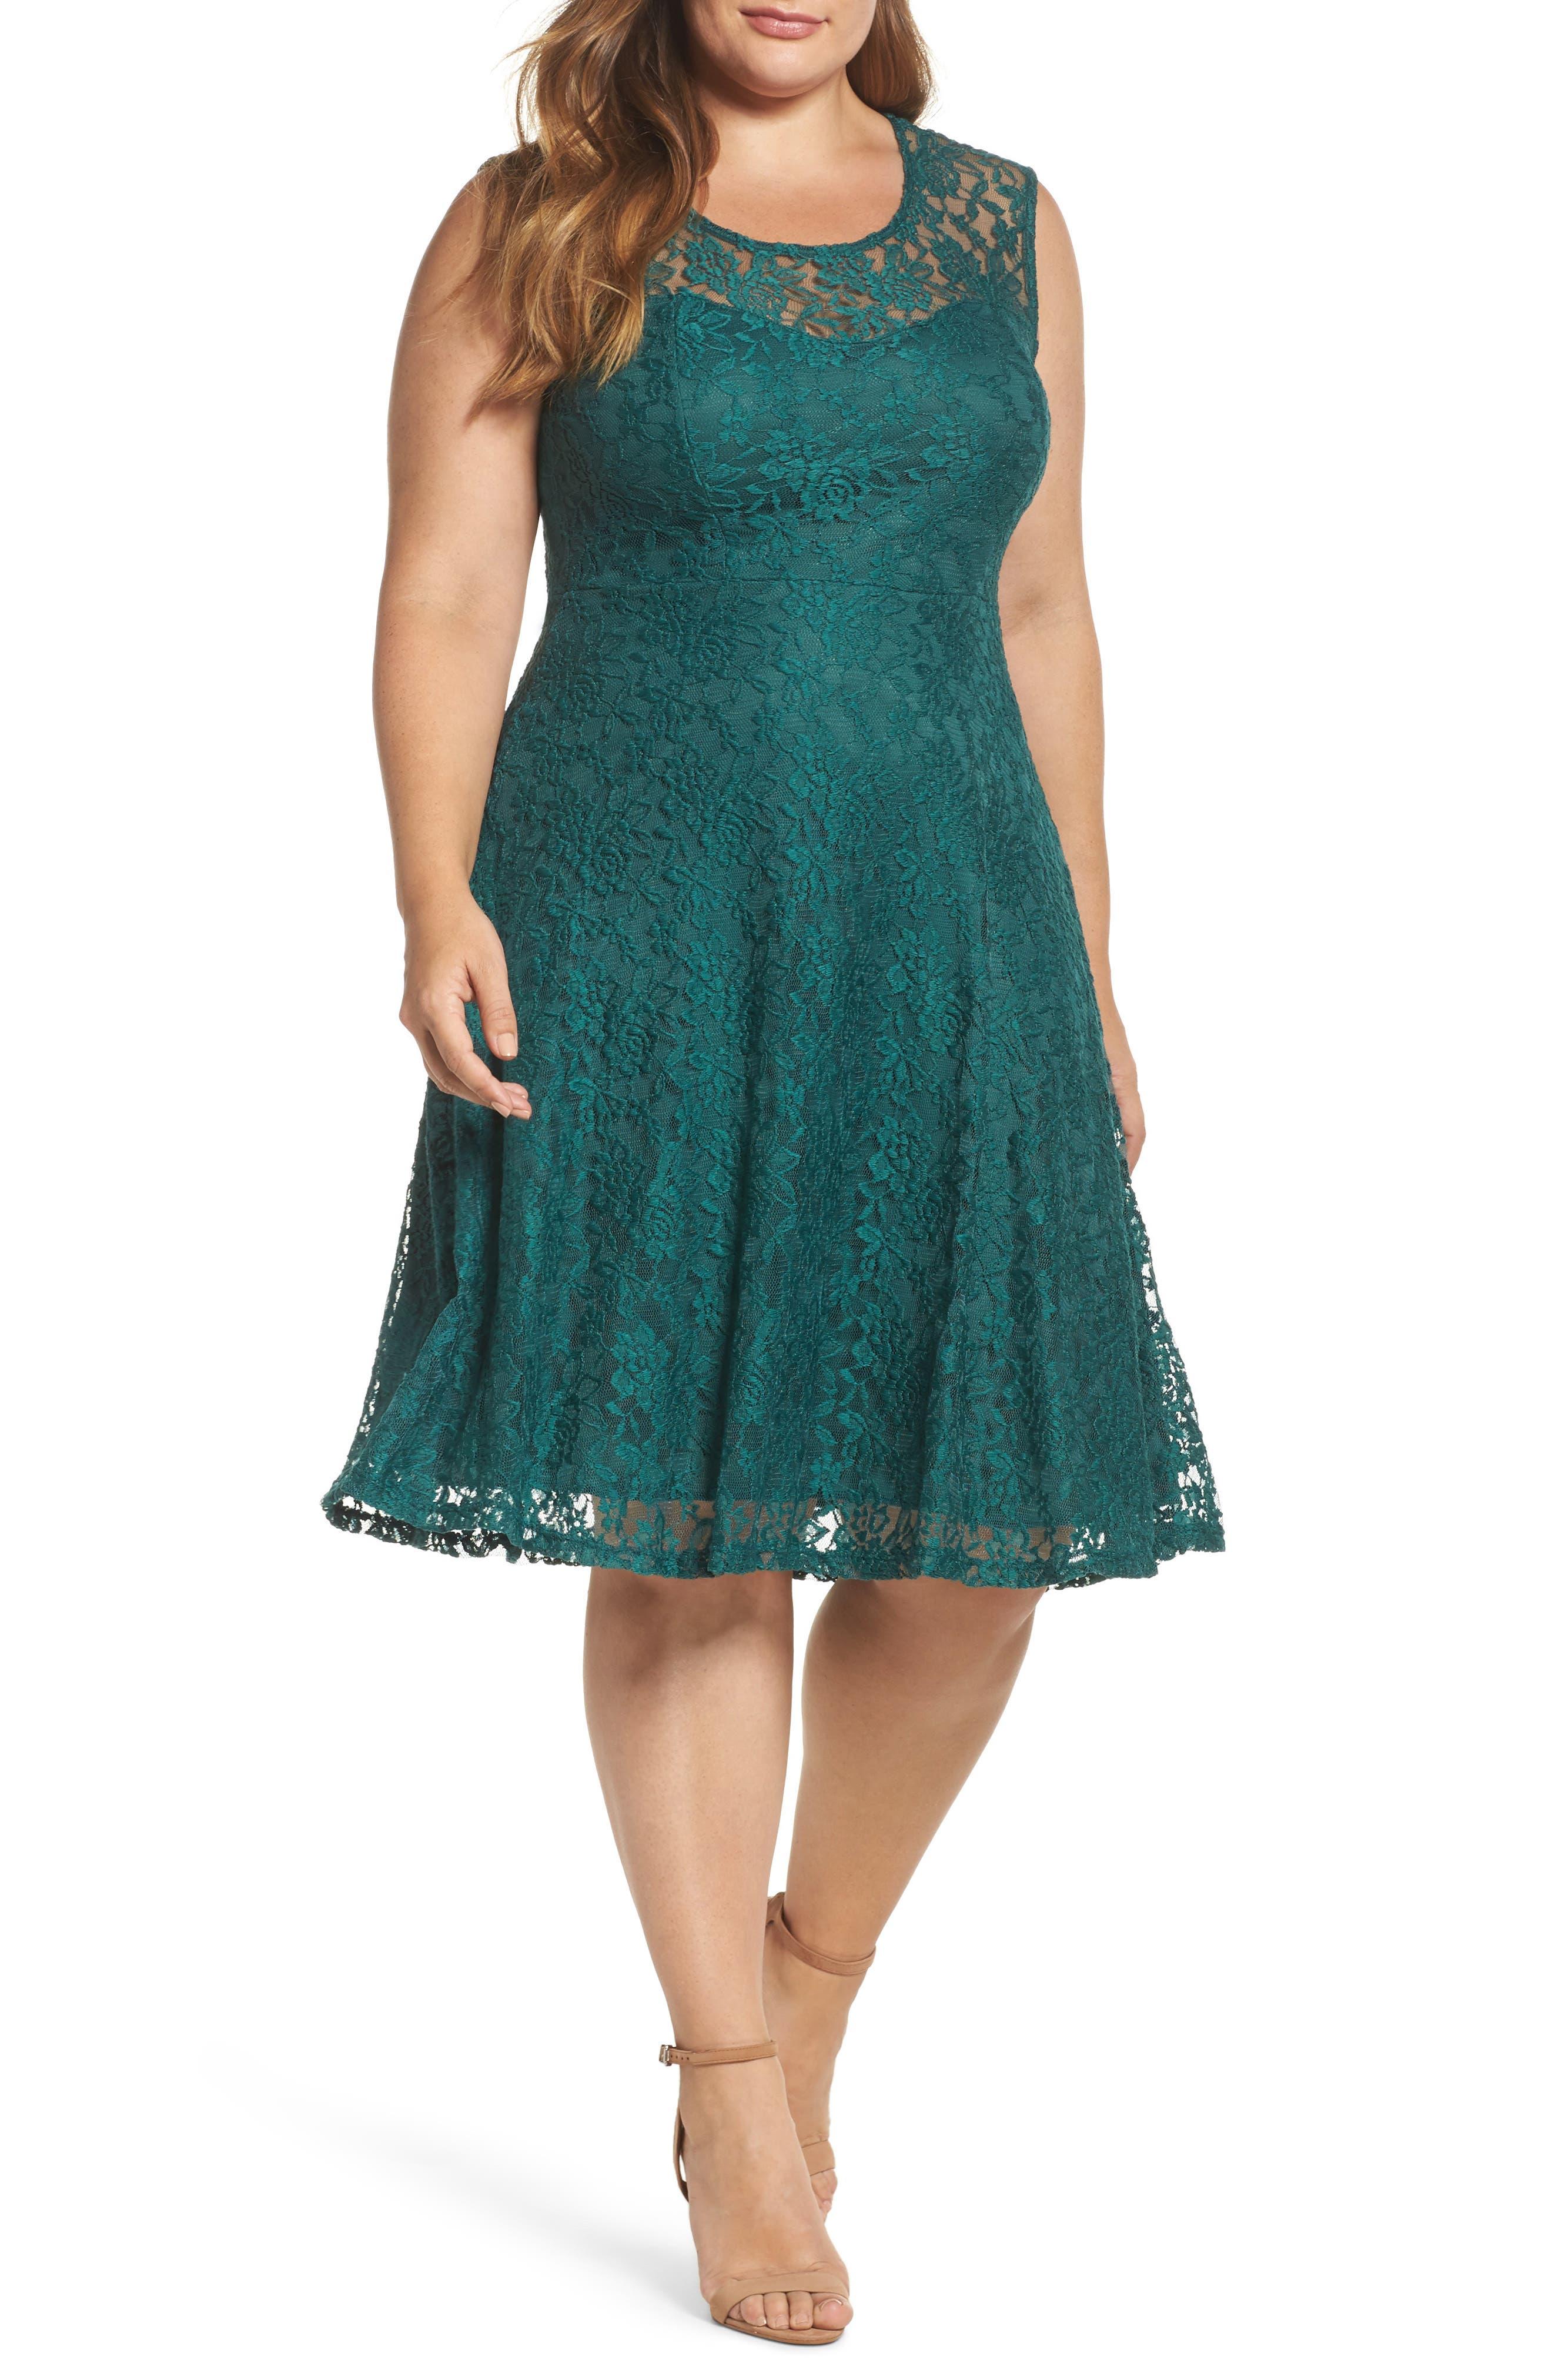 Main Image - Soprano Lace Skater Dress